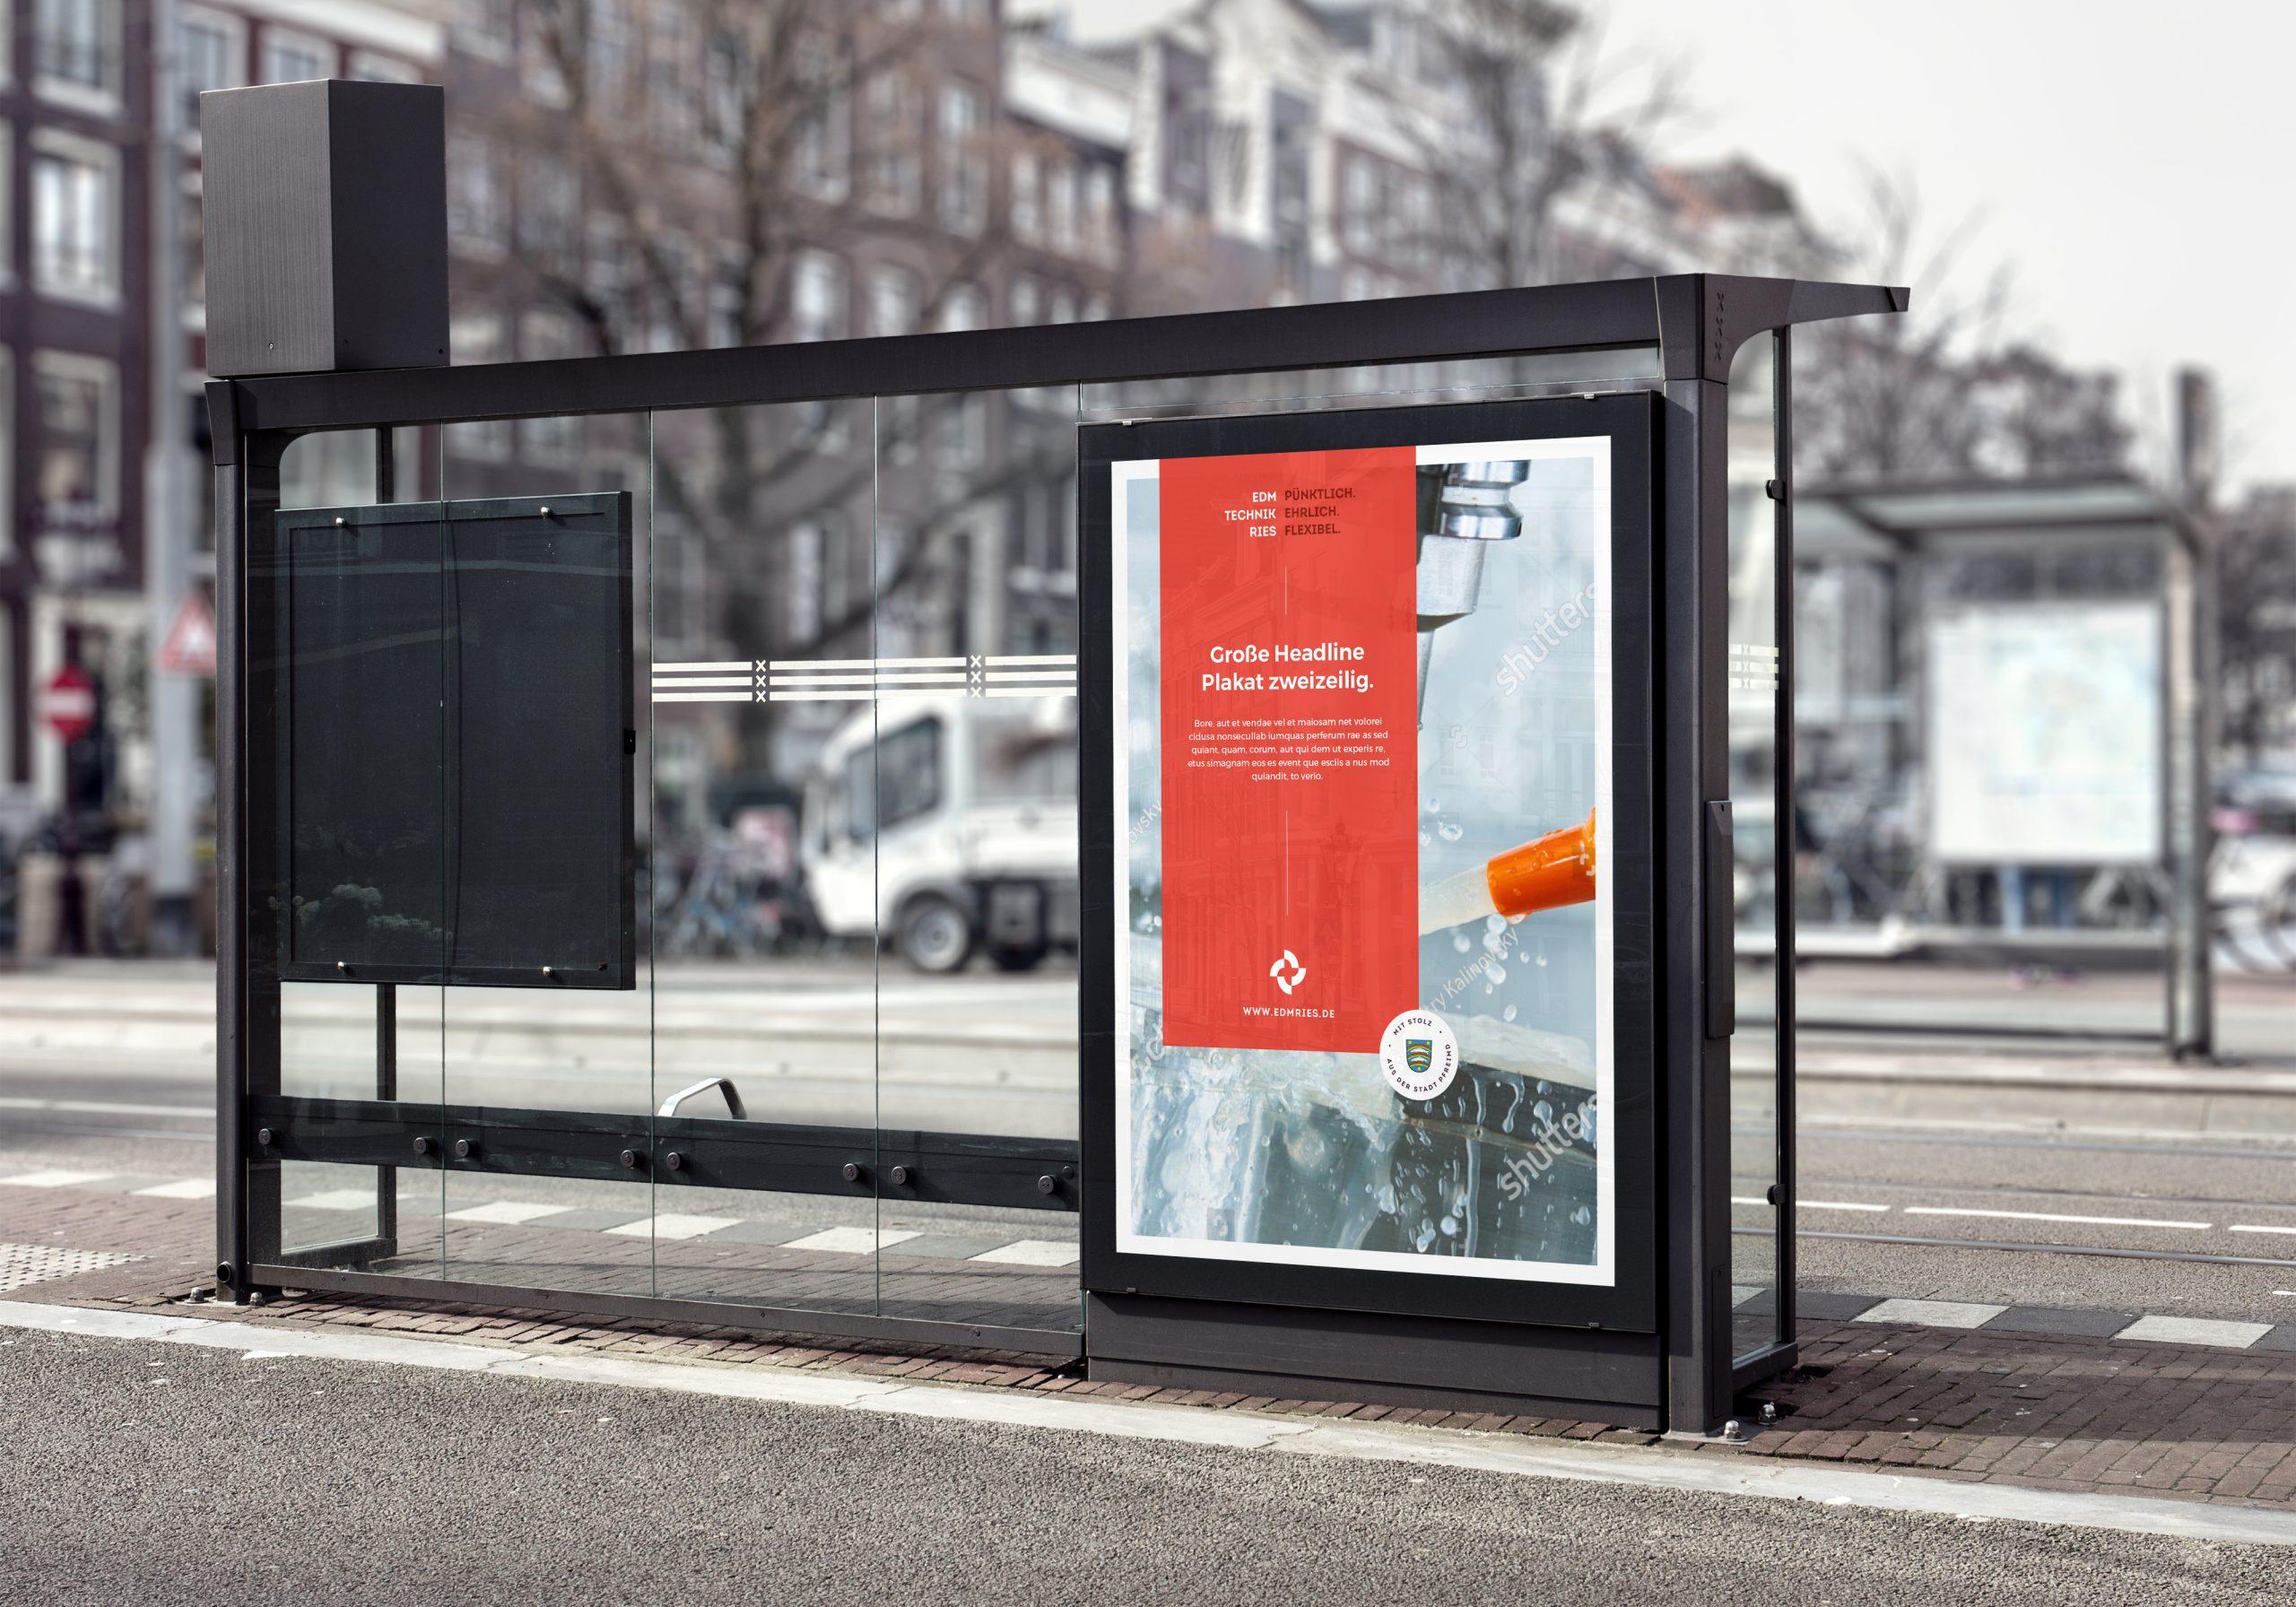 Bus-Stop-Billboard-MockUp-2